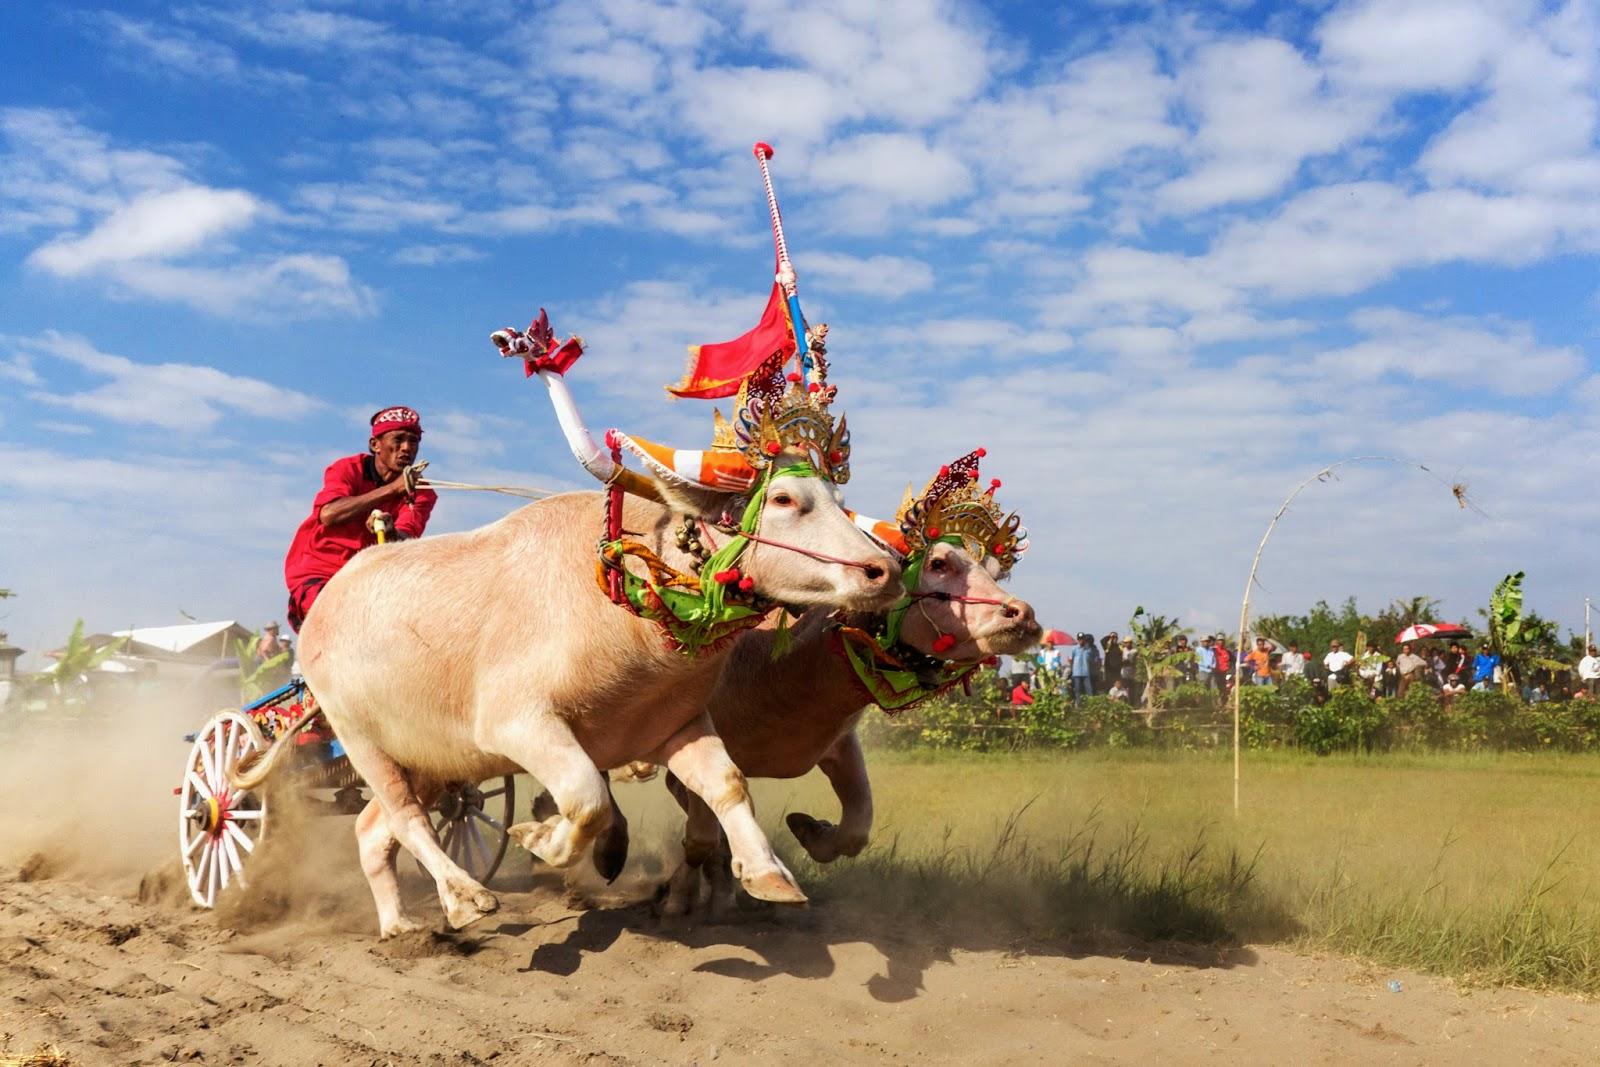 La corsa dei bufali di Bali: Makepung Buffalo Races